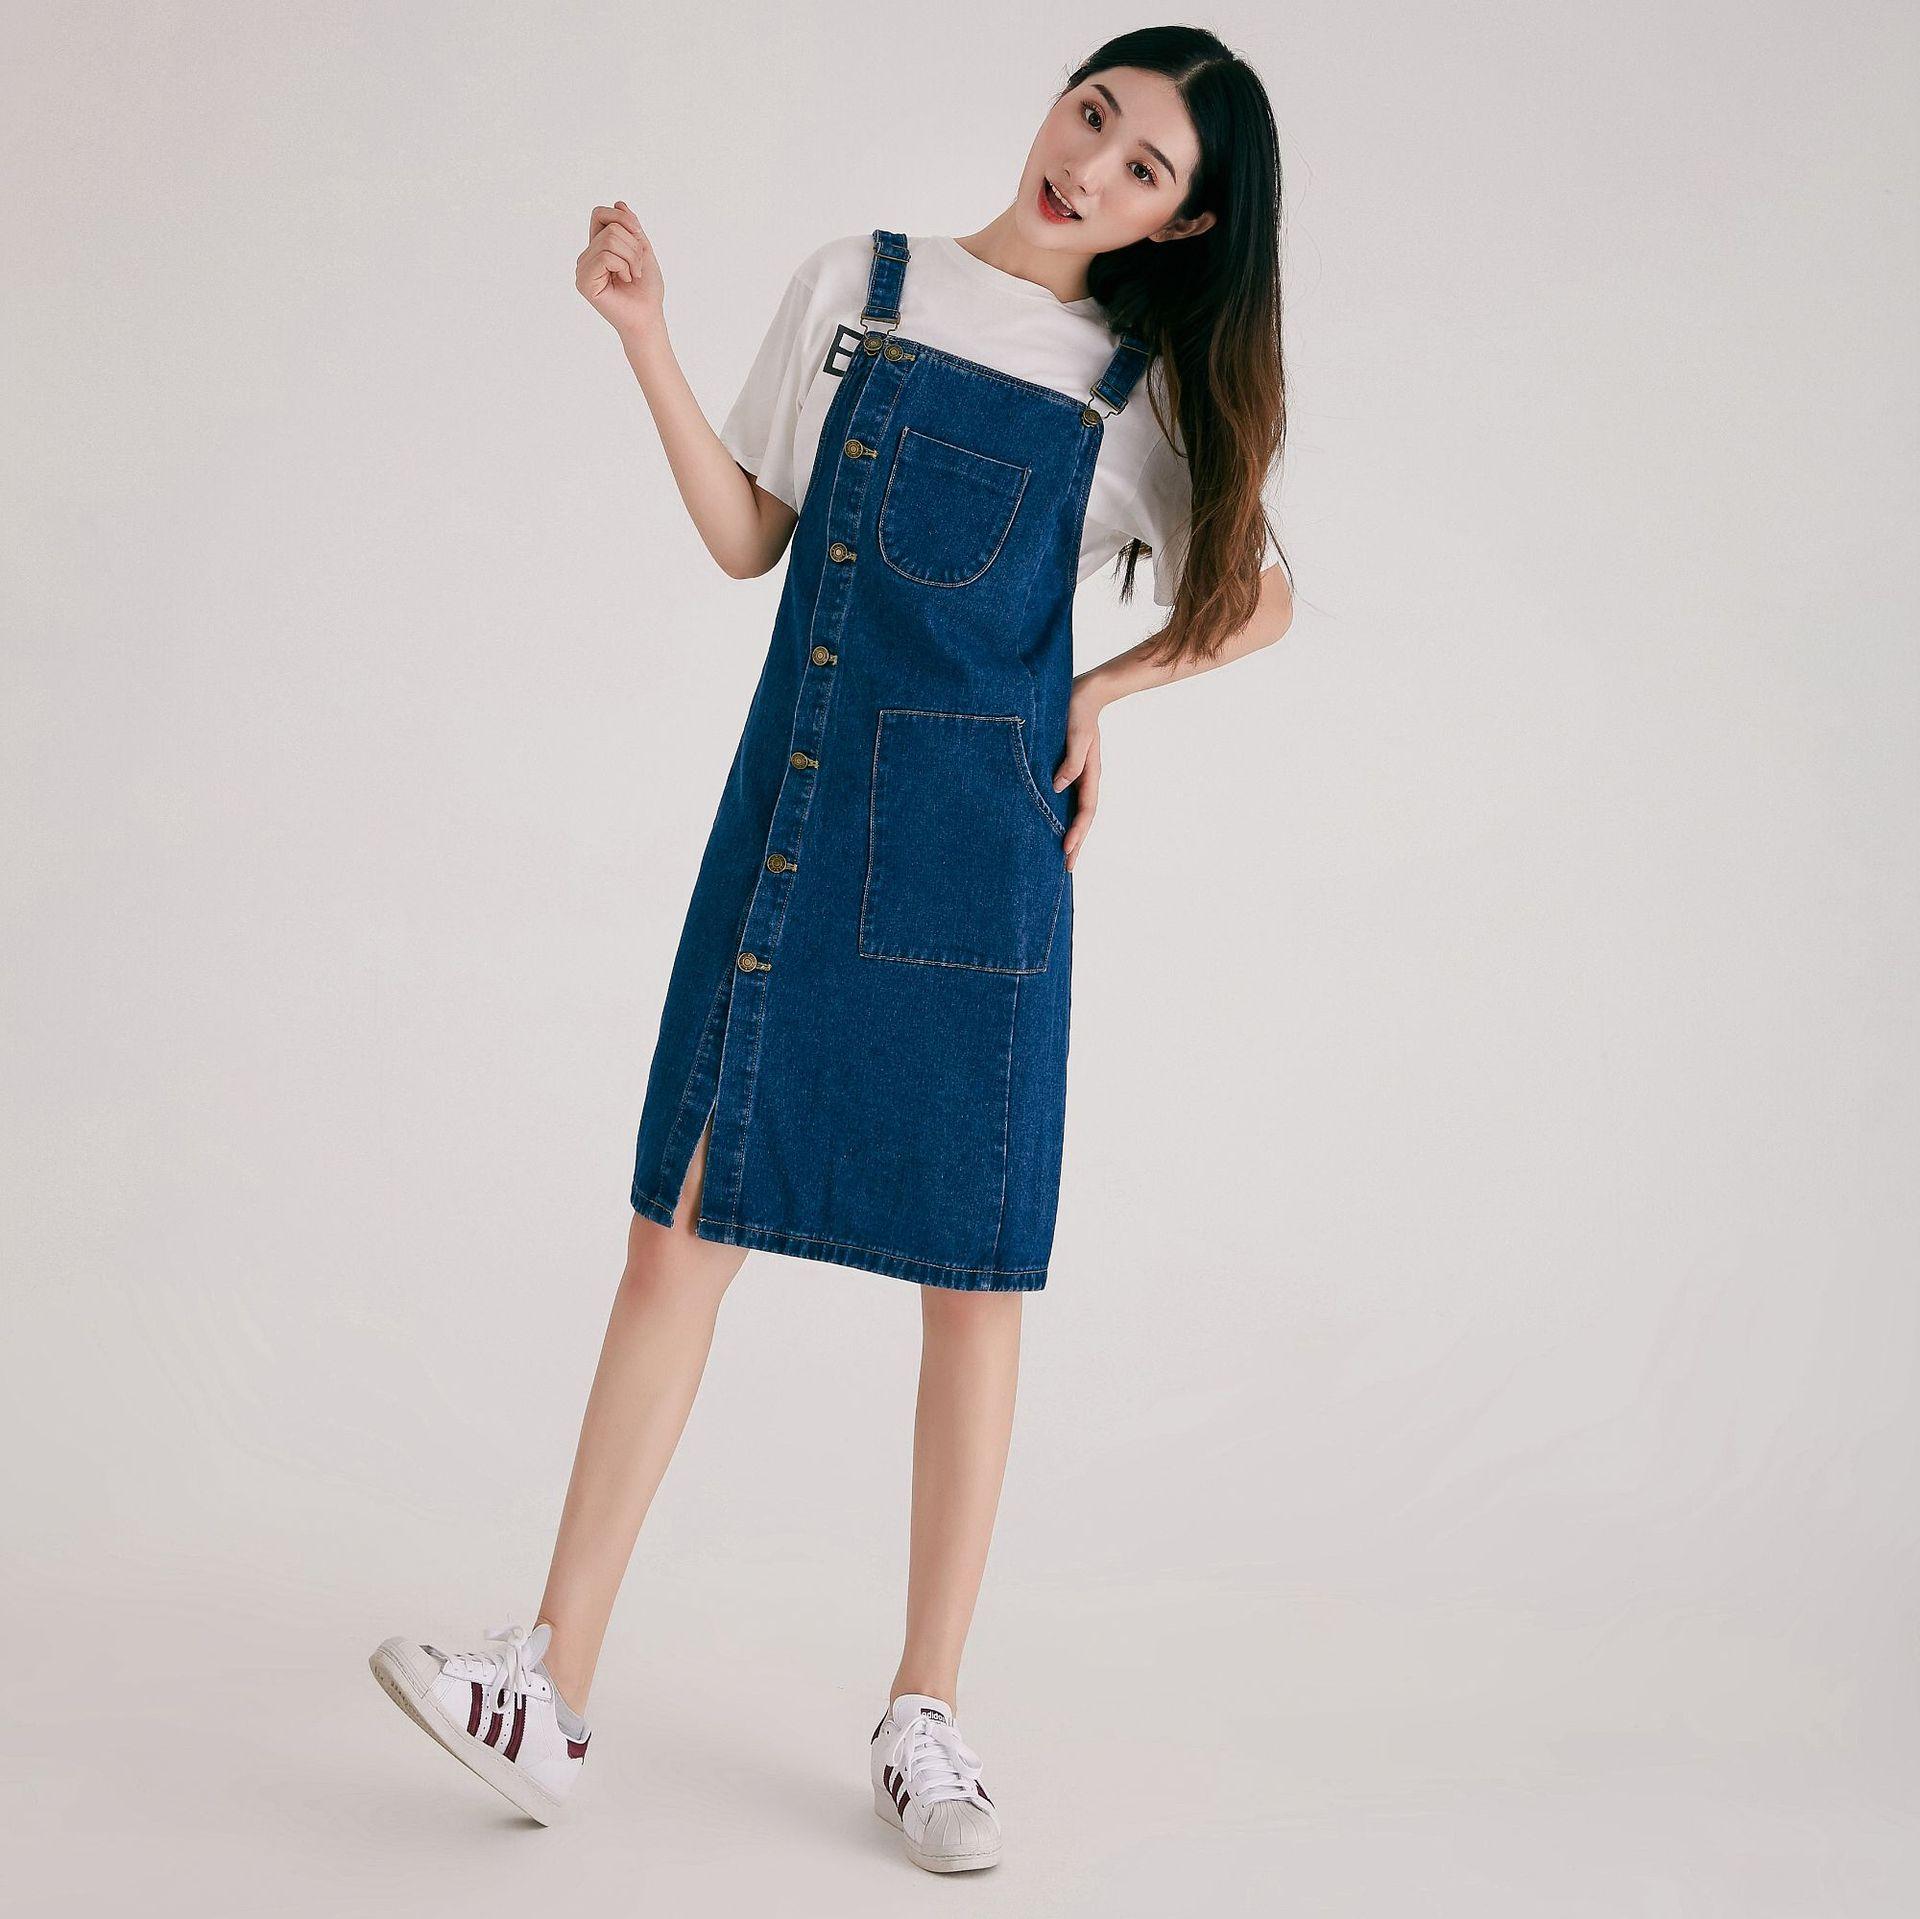 Large Size WOMEN'S Suspender Skirt 2019 Autumn Clothing New Style Deep Blue Korean-style Skirt Computer Cable Lock University St